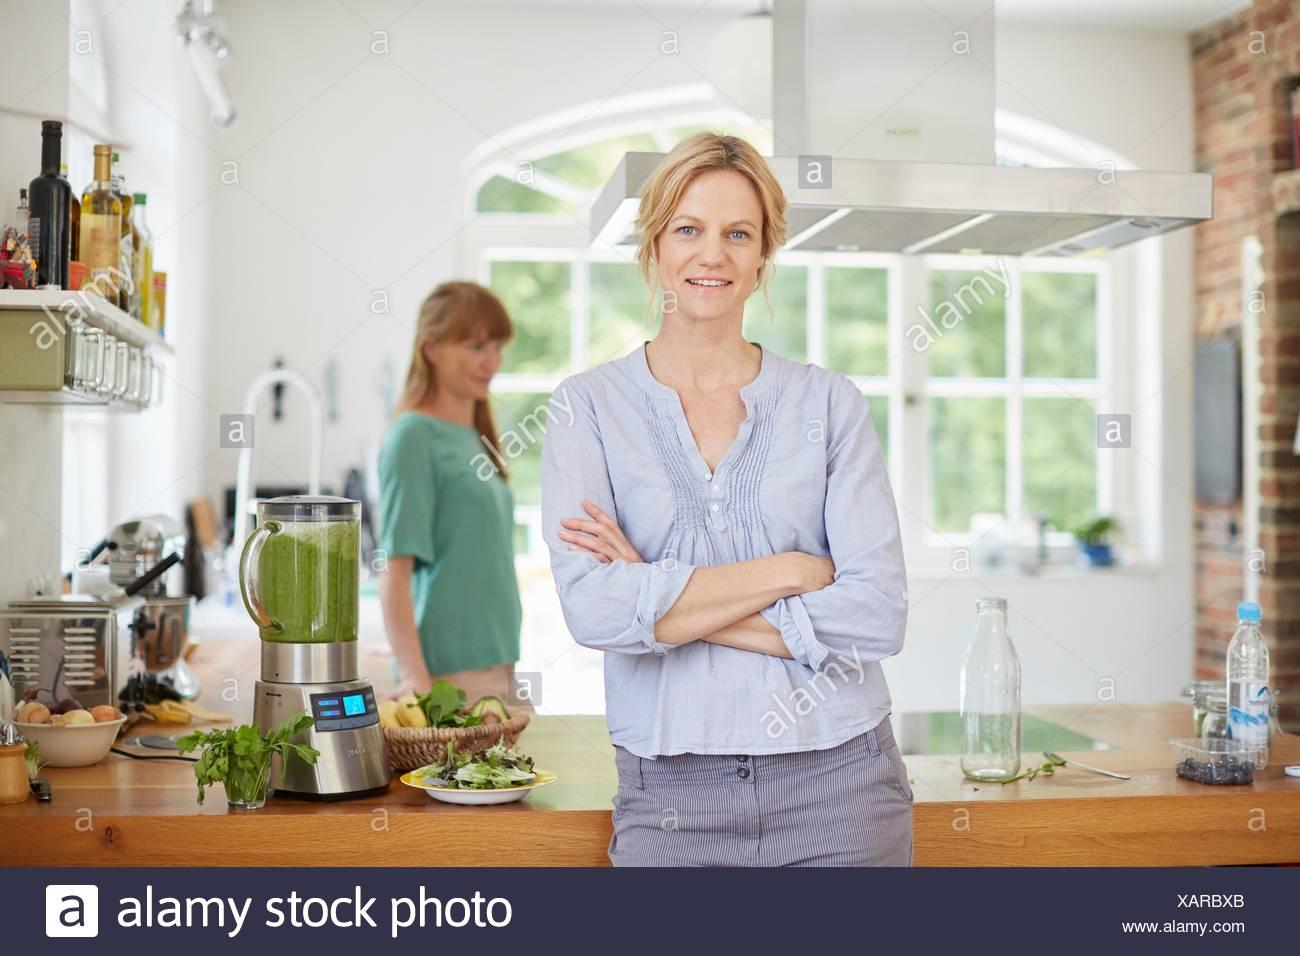 Frauen neben voller grüner veganen Smoothie Mixer Stockbild